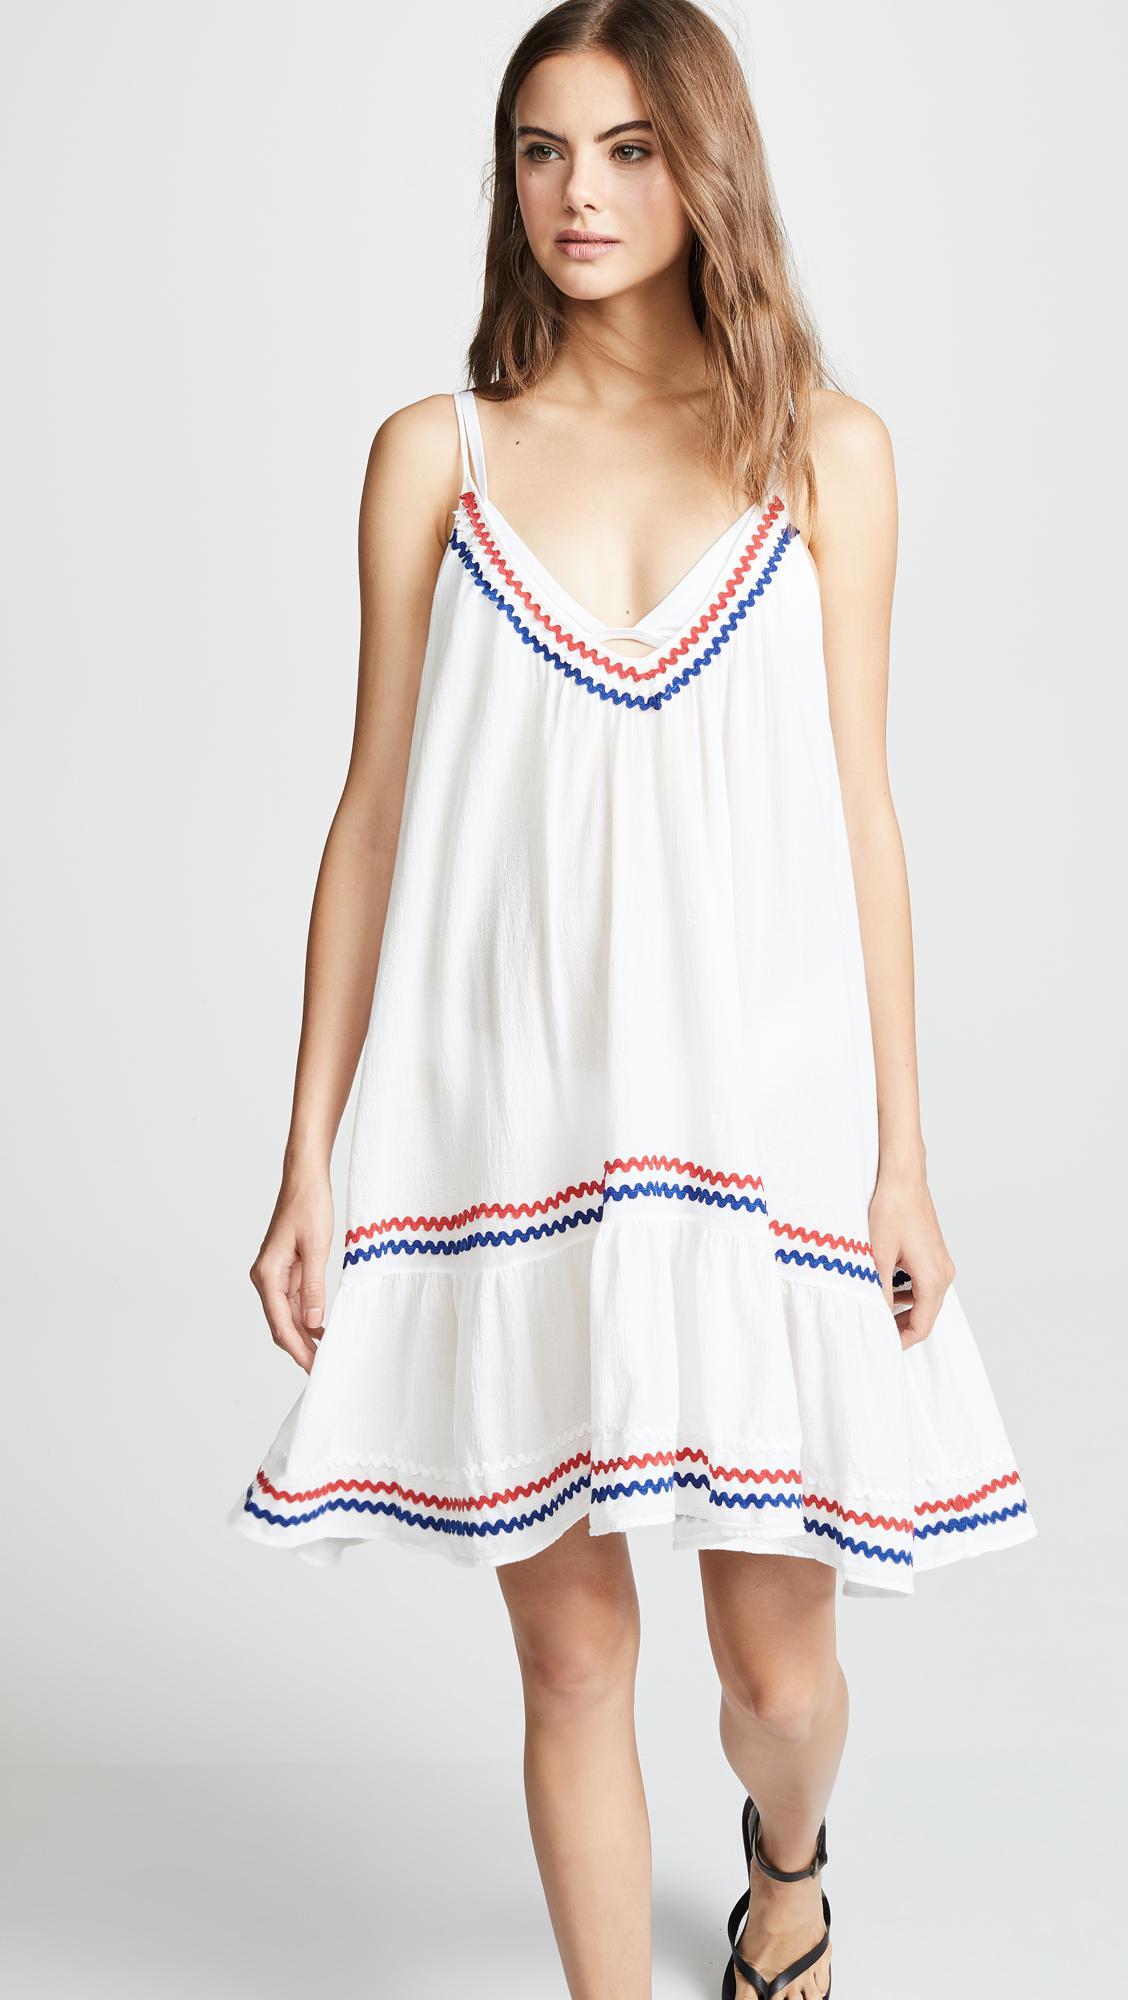 f3a1ec5a208c 9seed - White St Tropez Ruffle Mini Dress - Lyst. View fullscreen